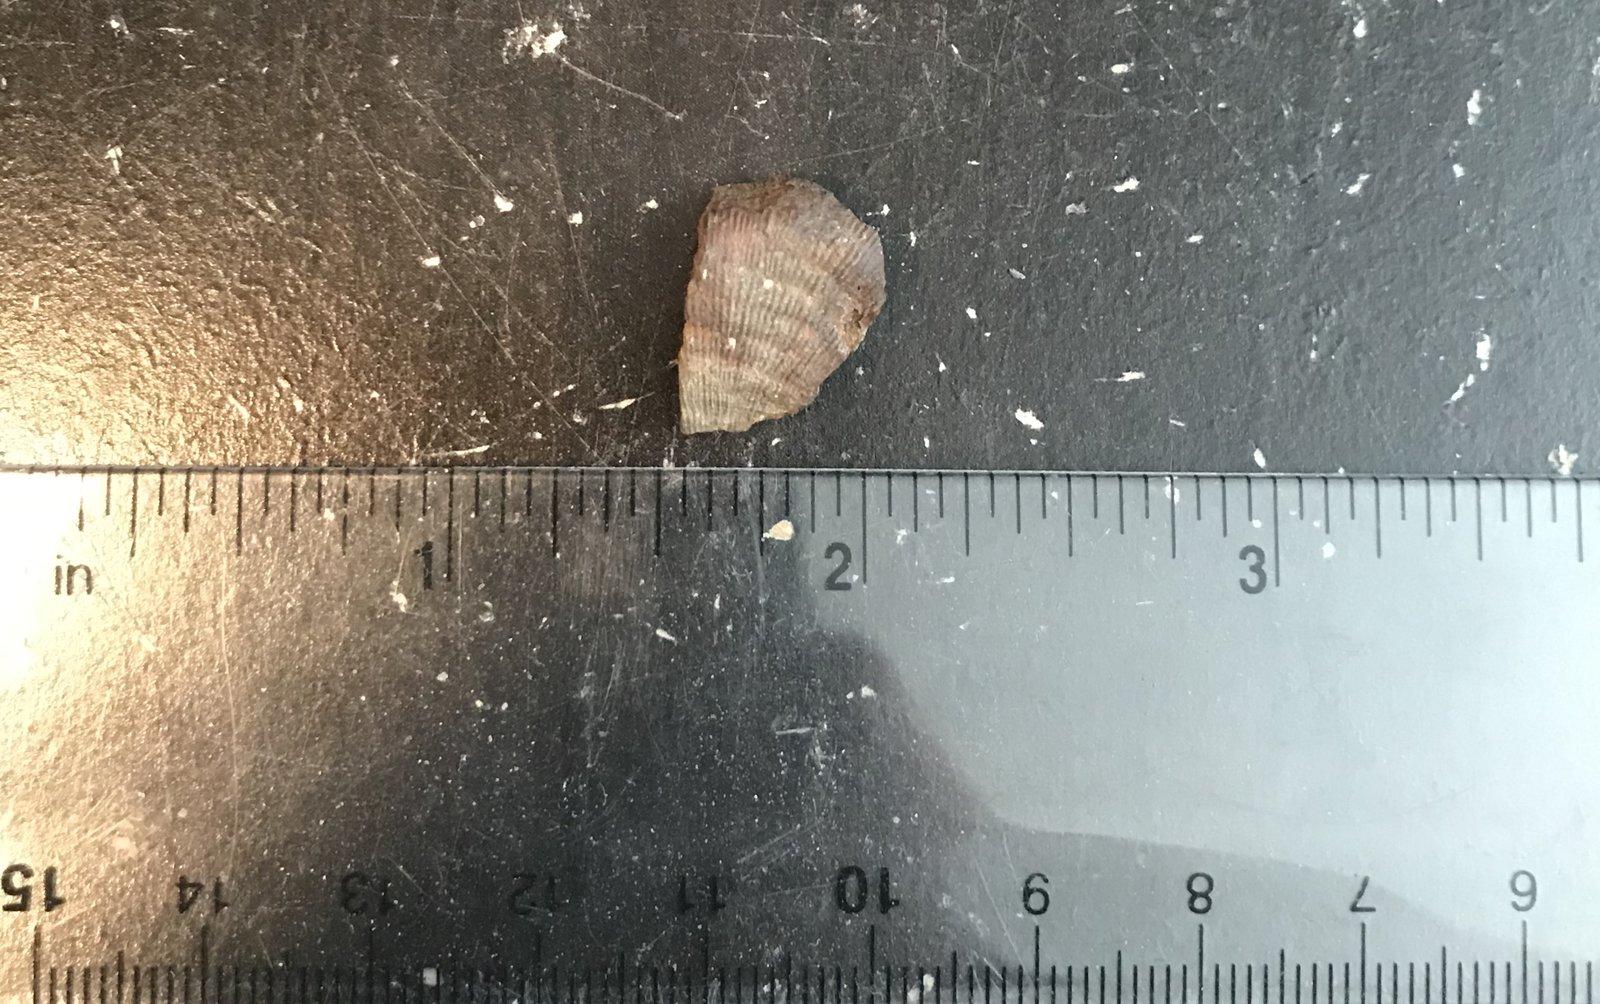 Pyritized brachiopod from the Kalkberg Formation